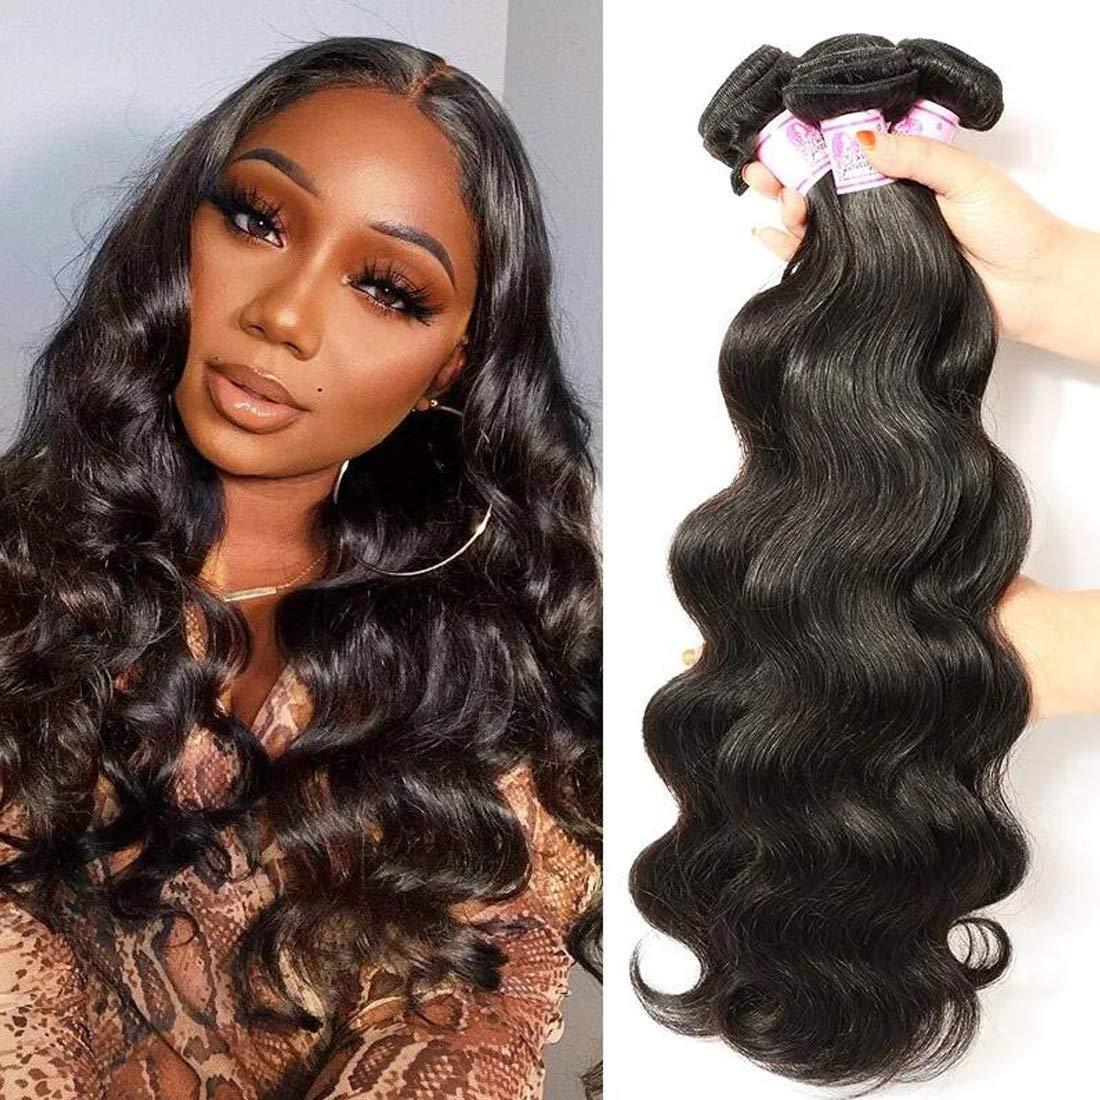 BF Hair gift Brazilian Body Wave 3 100% Un 24inch Deluxe 22 Bundles 20